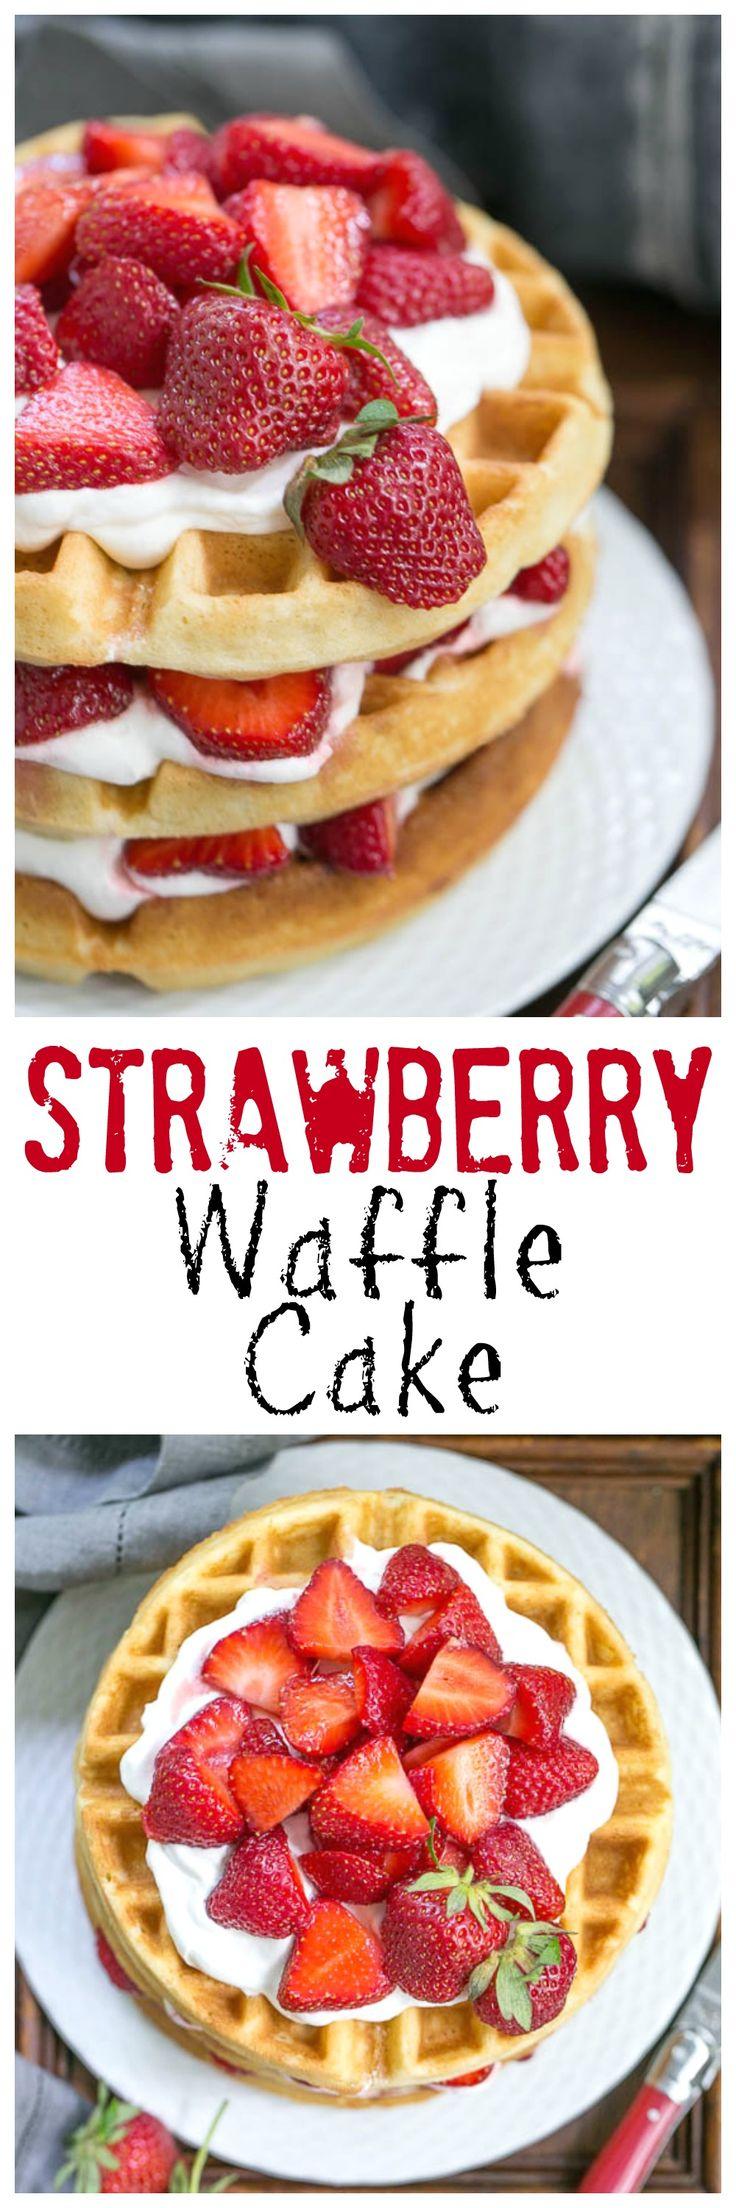 Strawberry Waffle Cake | A sensational layered dessert reminiscent of strawberry shortcake with waffles made of cake batter! @lizzydo